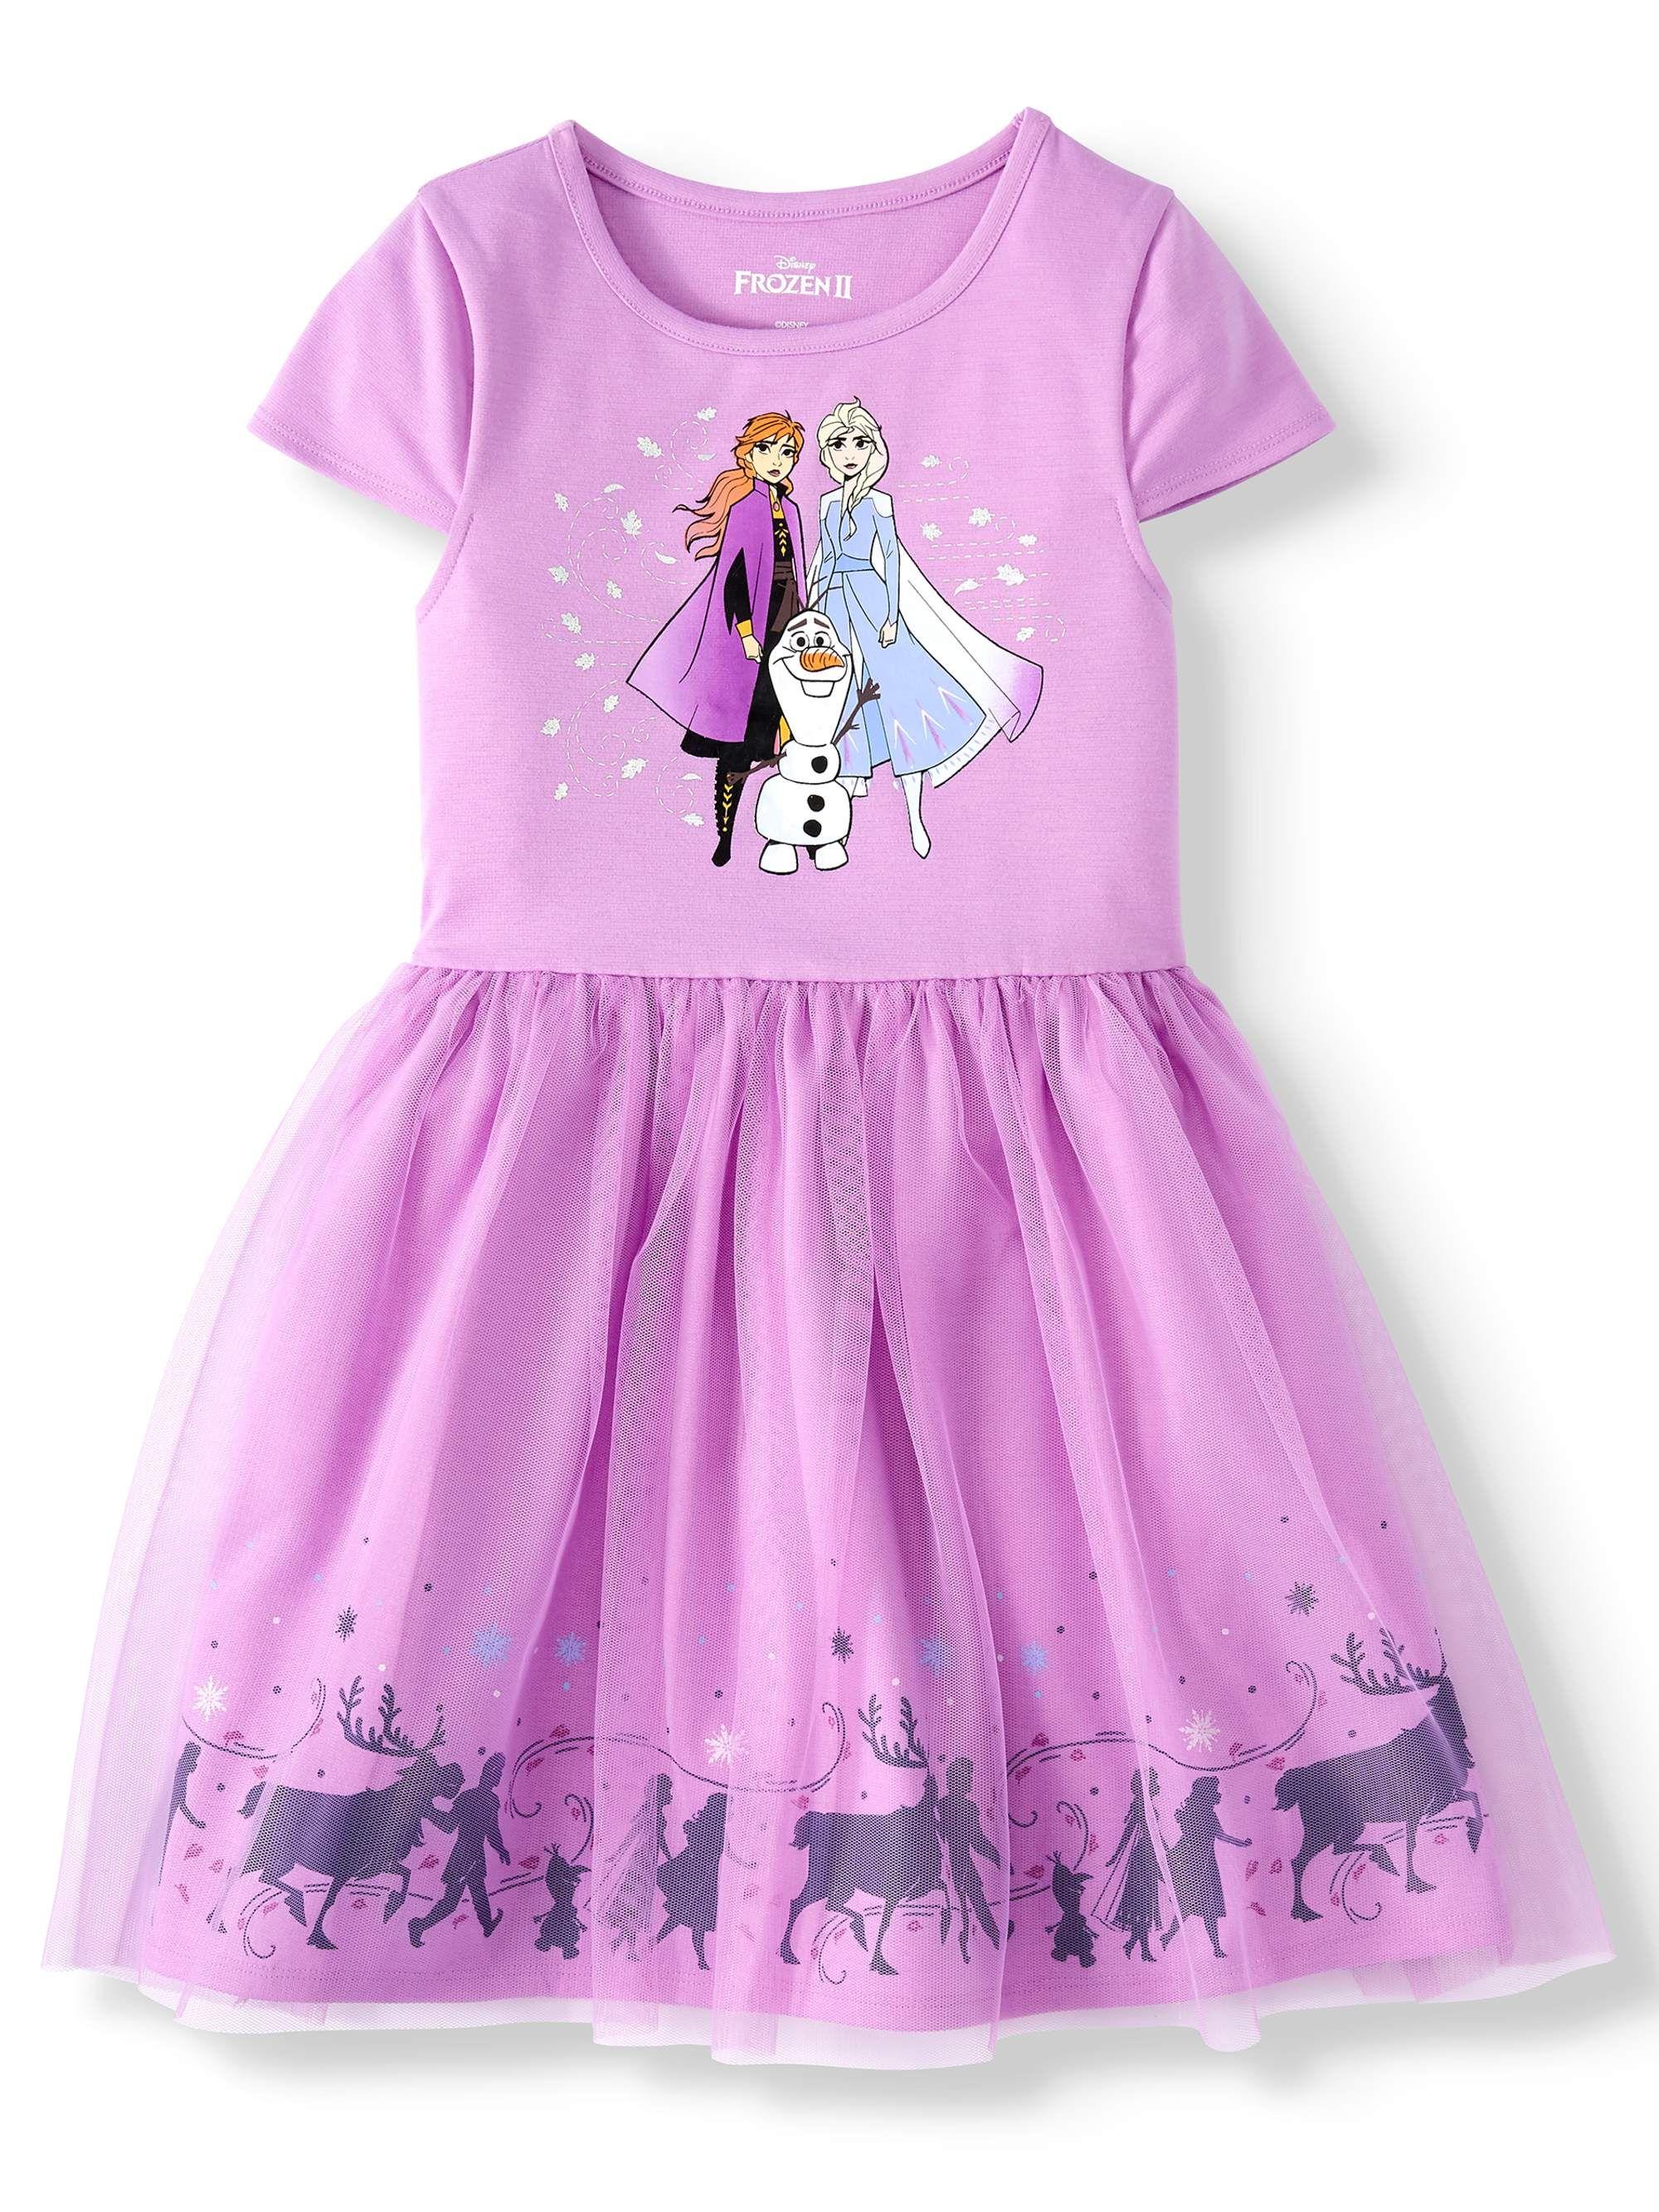 Frozen II Disney Anna Nightgown for Girls Multi